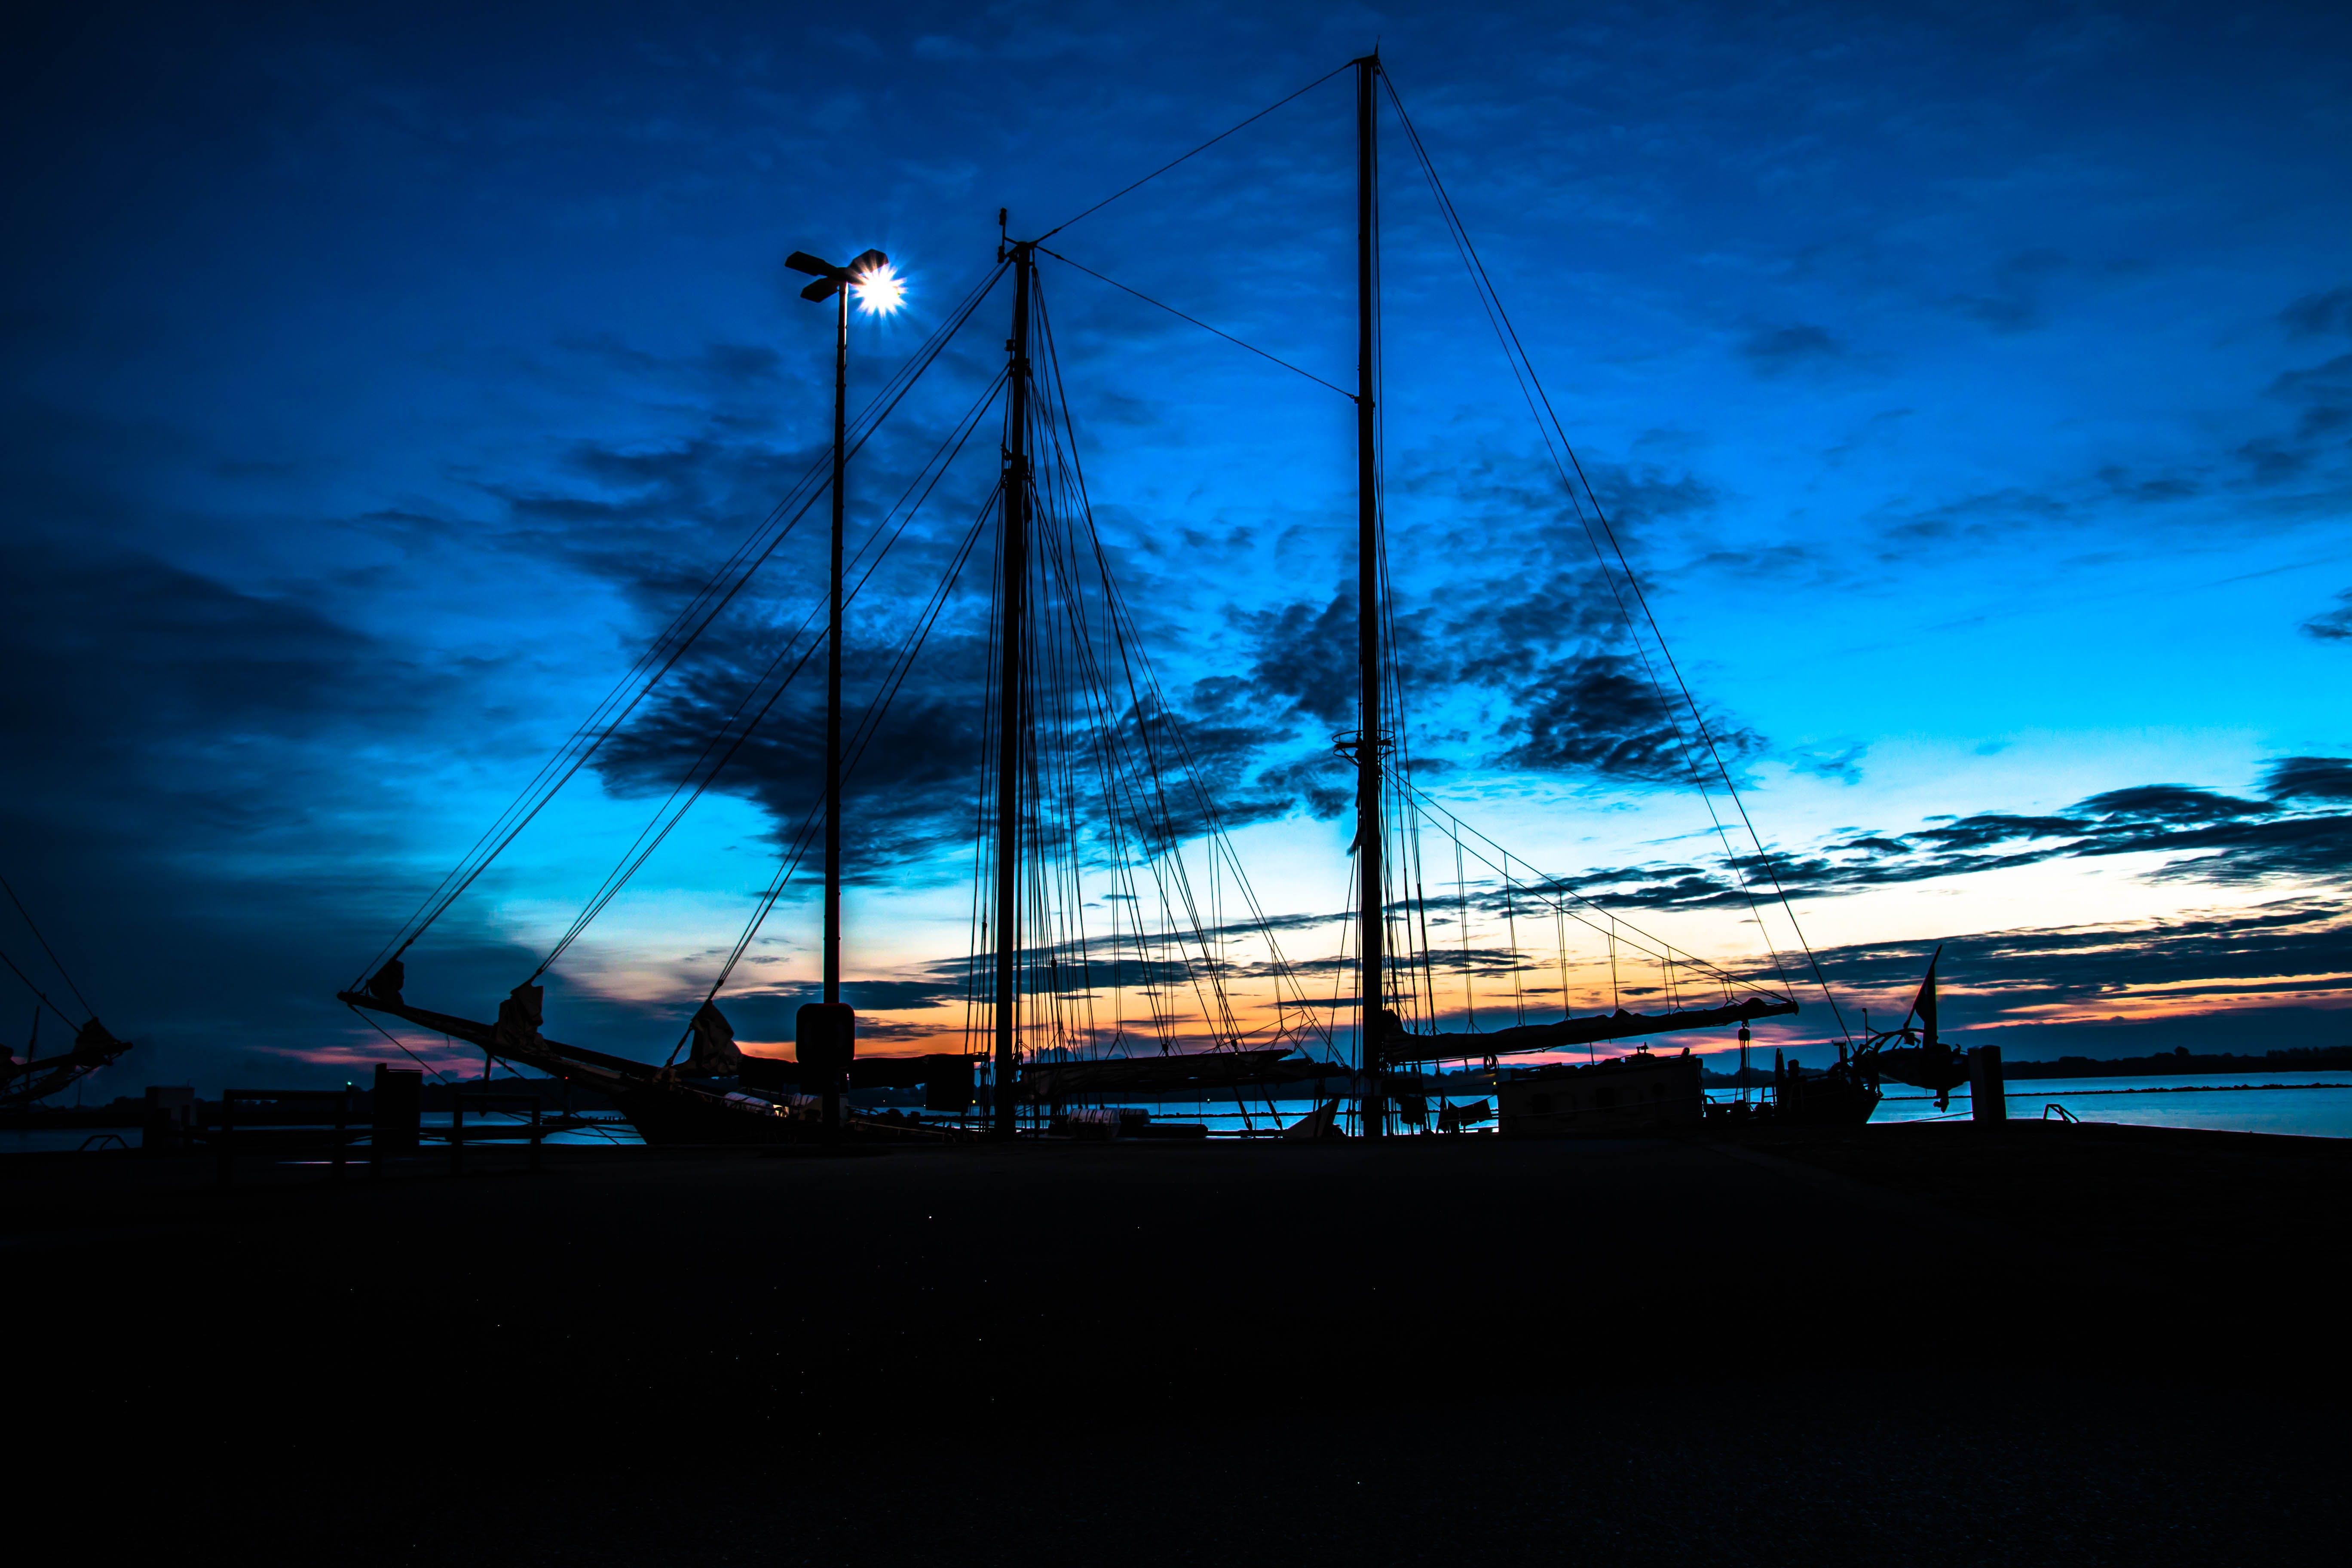 Silhouette Photo of Black Sailing Ship